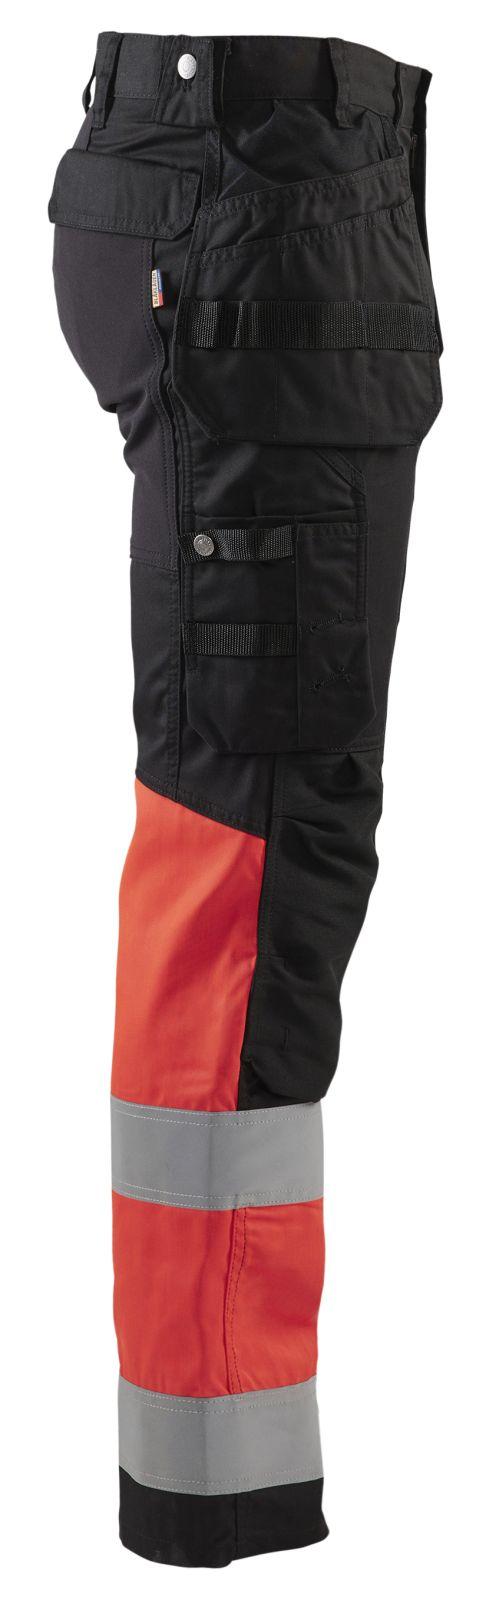 Blaklader Werkbroeken 15581811 High Vis zwart-fluo rood(9955)